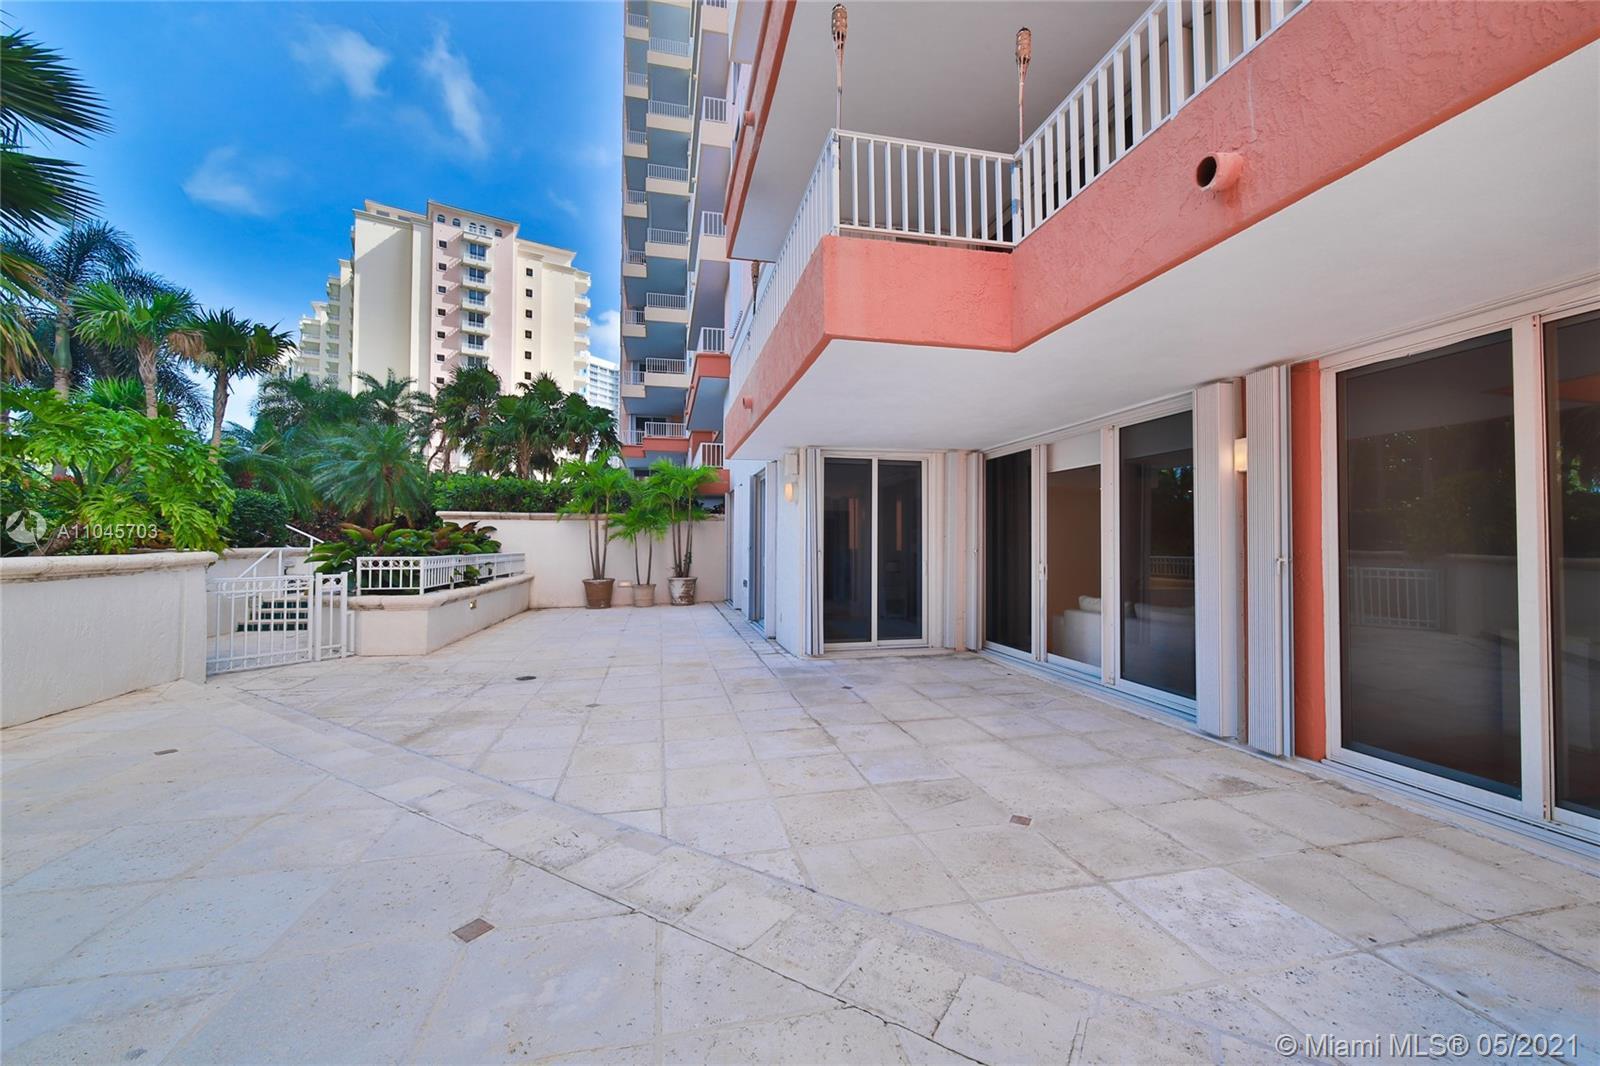 Club Tower 1 #206 - 789 Crandon Blvd #206, Key Biscayne, FL 33149